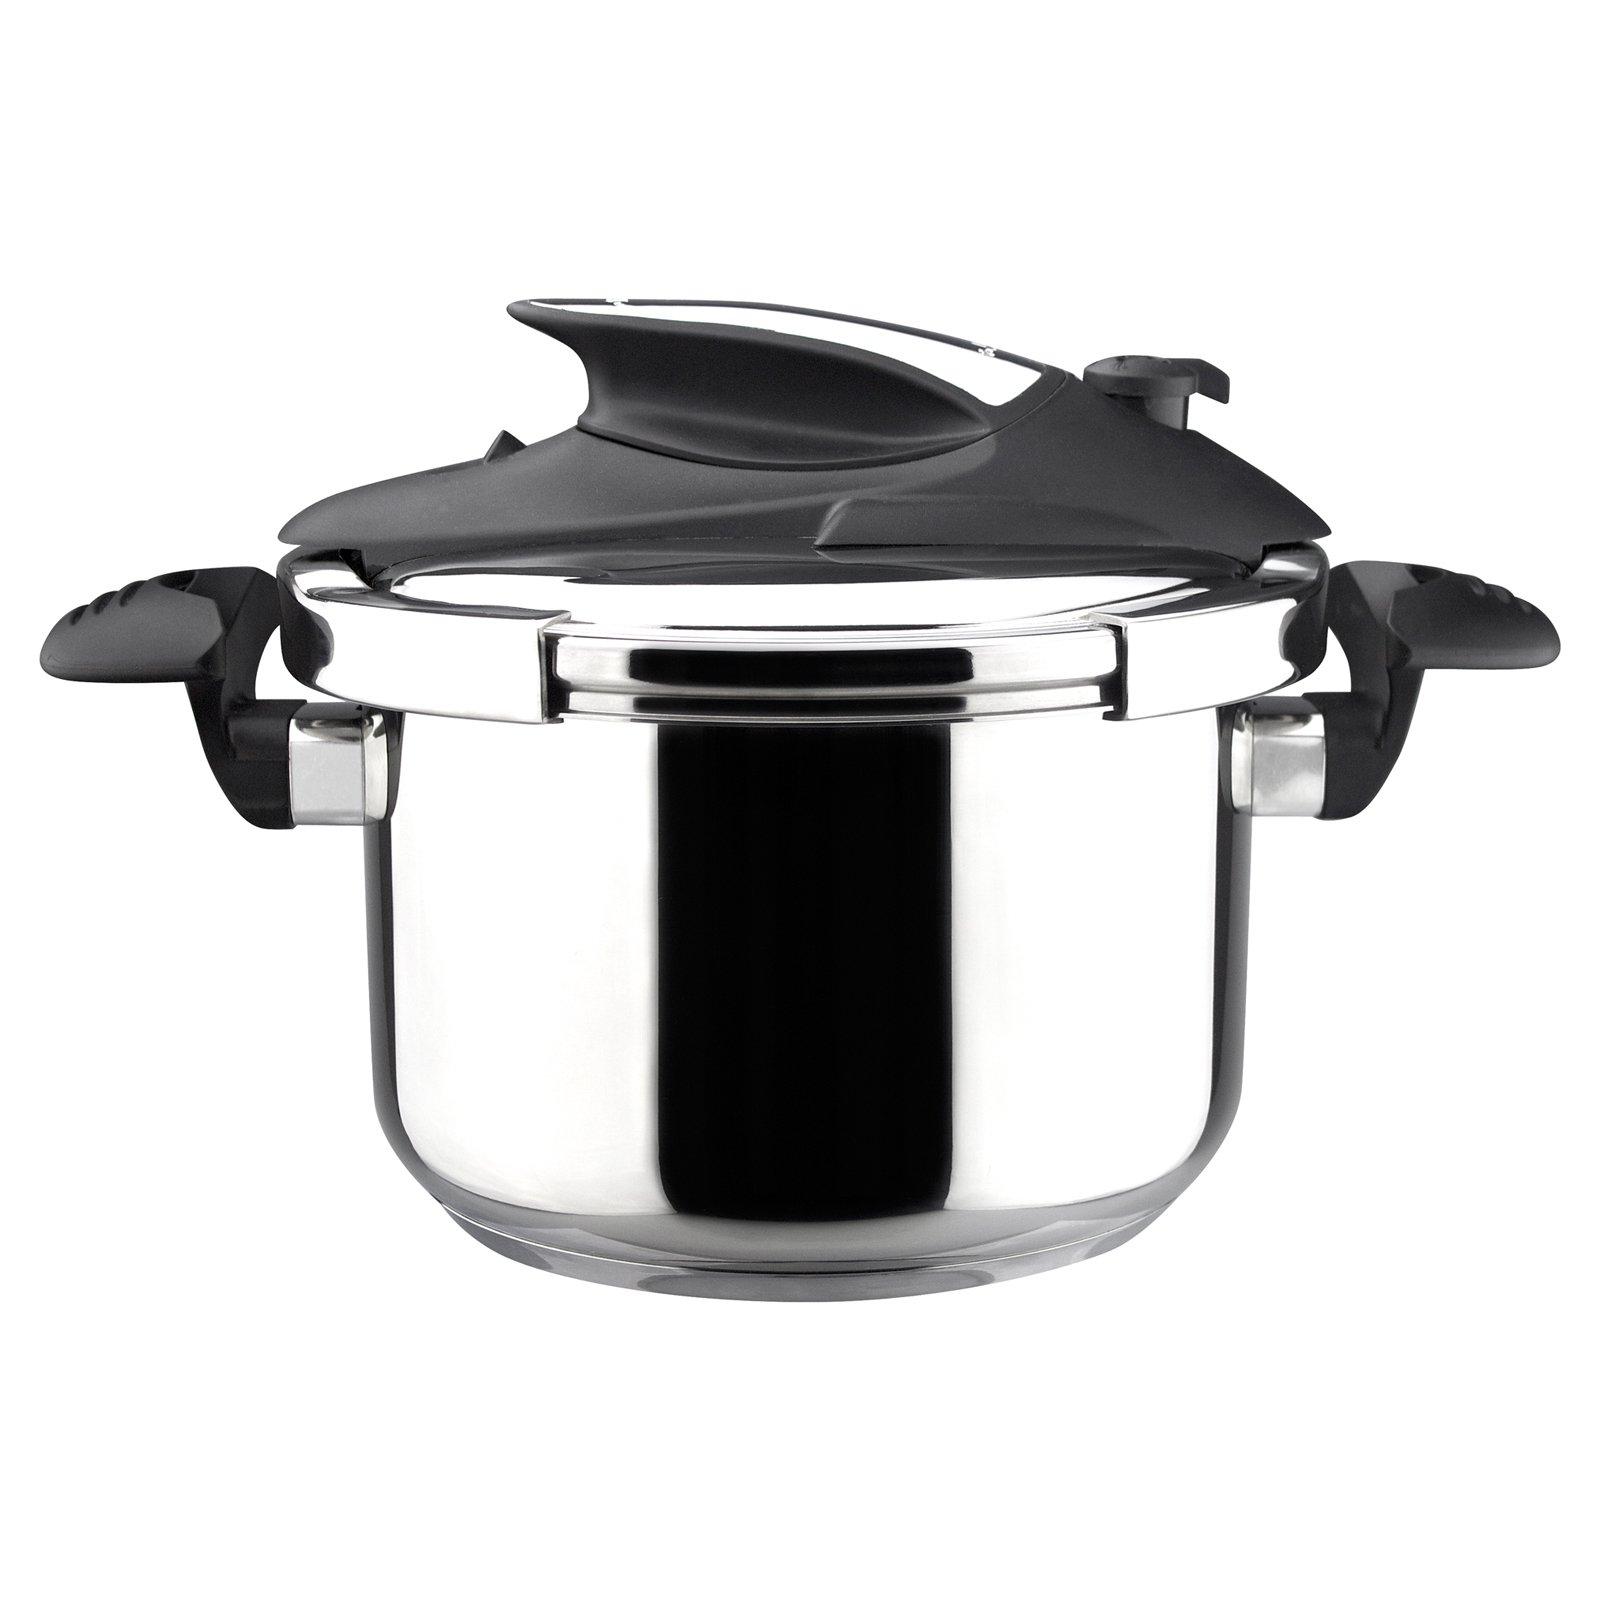 Magefesa Nova 4.2 qt. Stainless Steel Fast Pressure Cooker